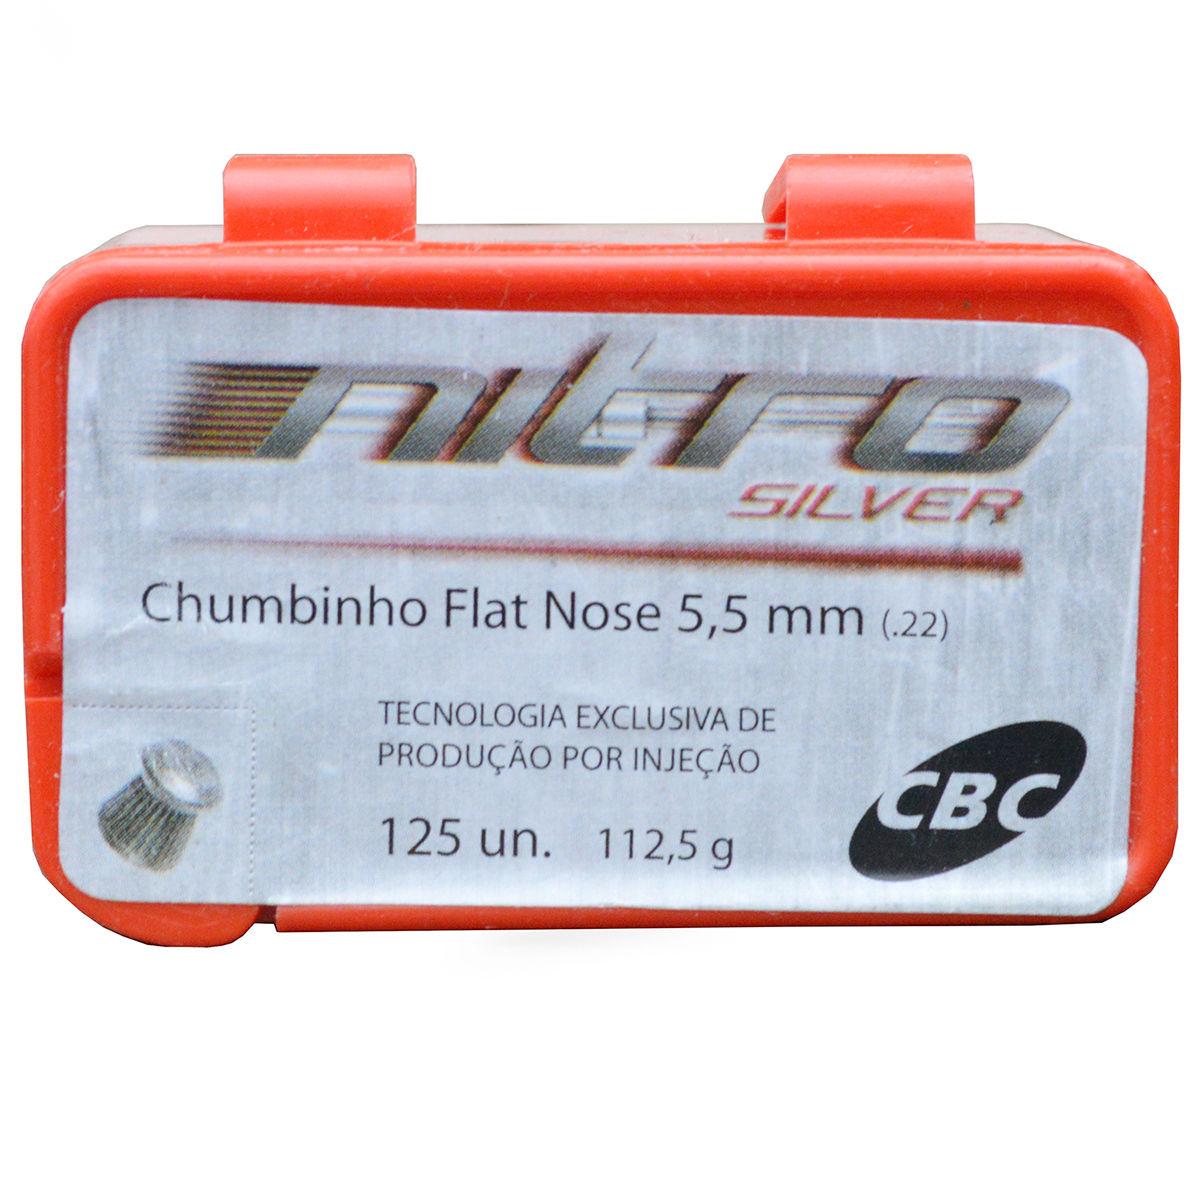 Chumbinho 5,5mm Nitro CBC Silver Flat Nose - 125 Peças